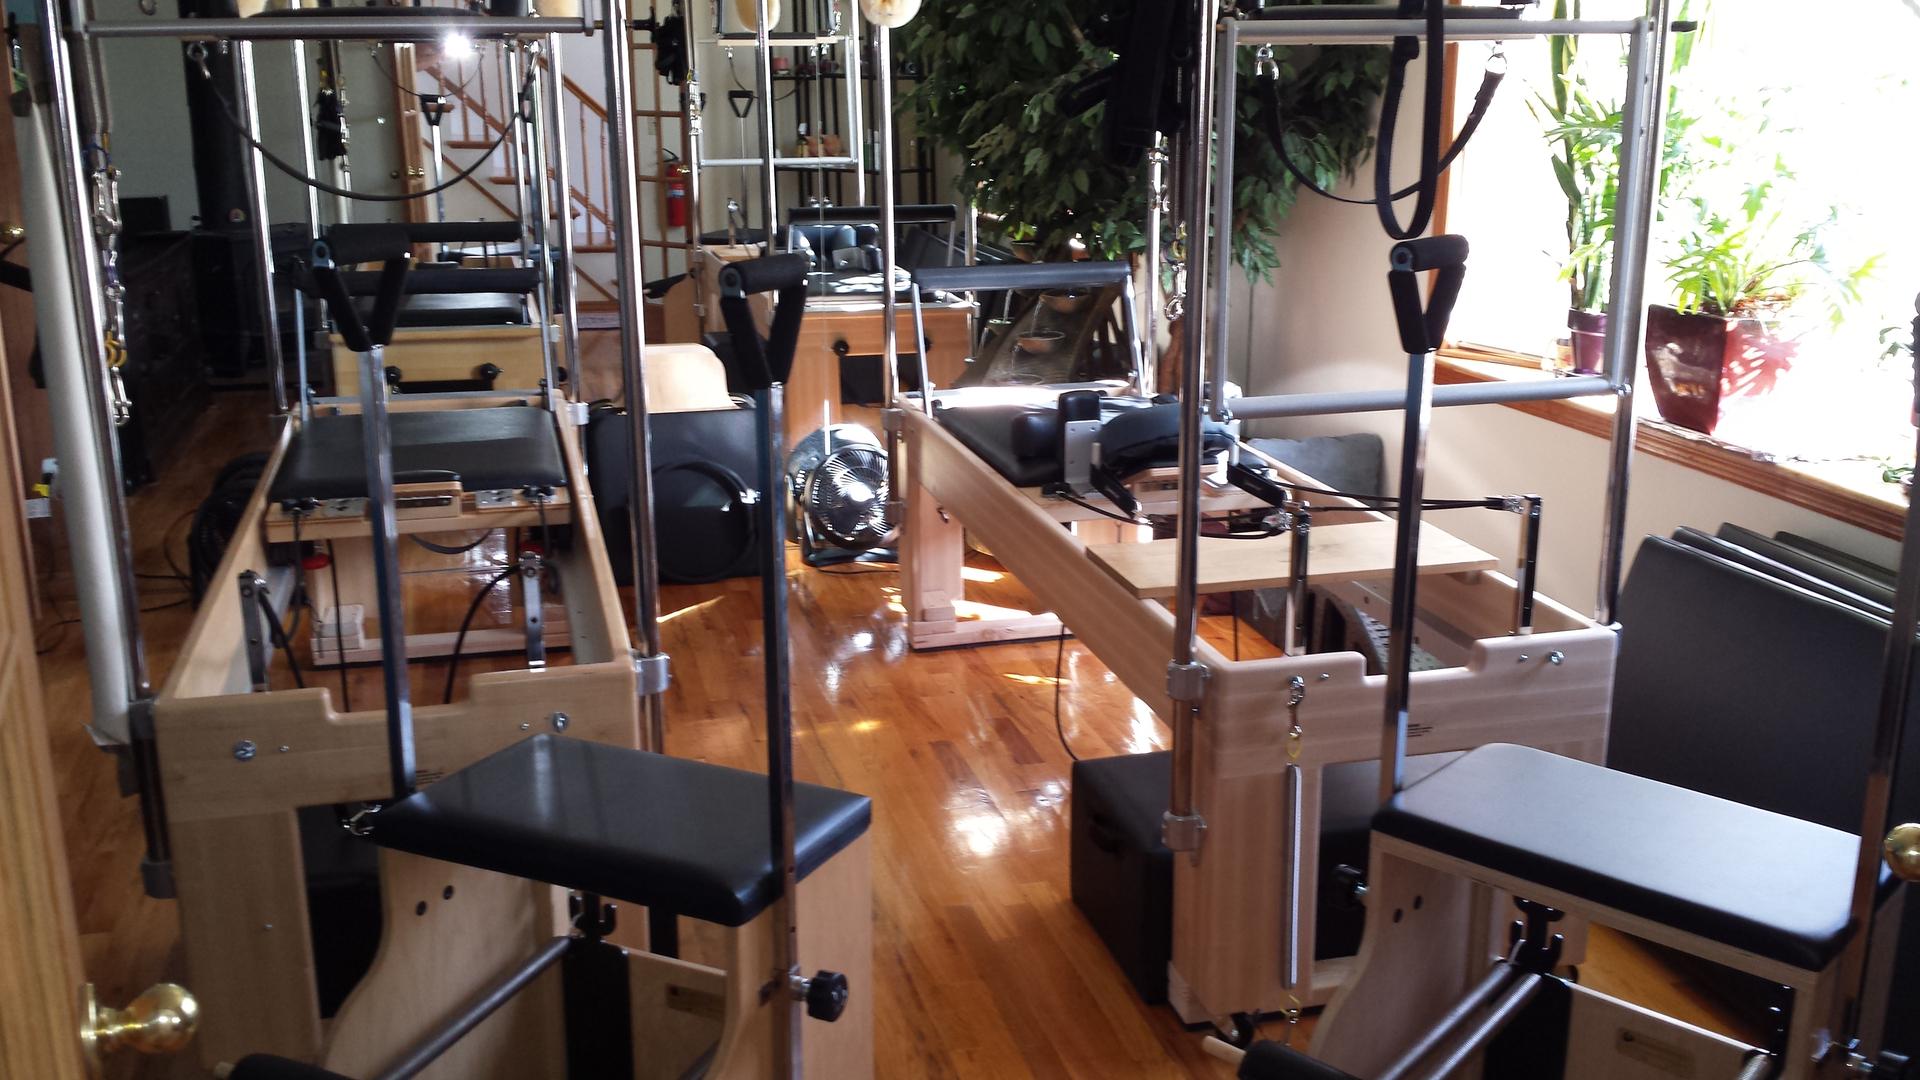 Balanced body pilates chair - Massage Therapy